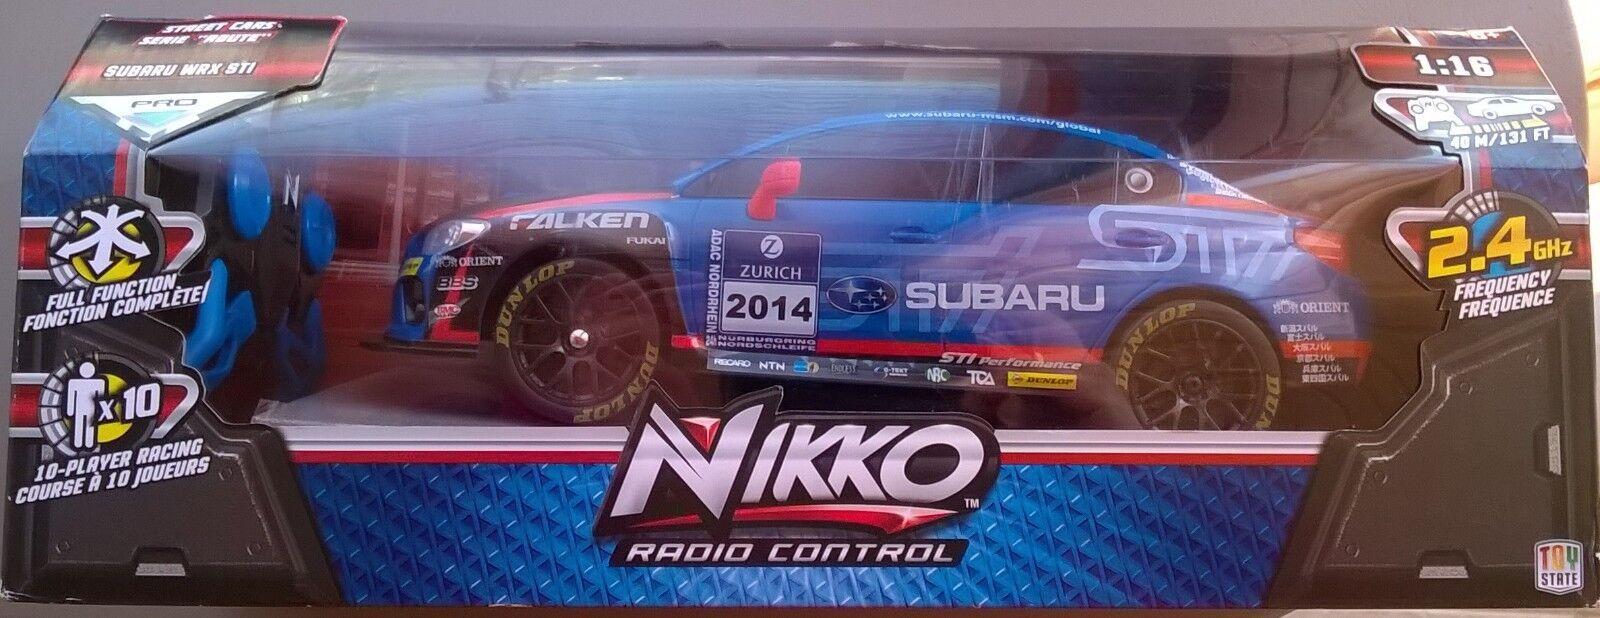 Nikko radio control  Subaru WRX STI 1 16